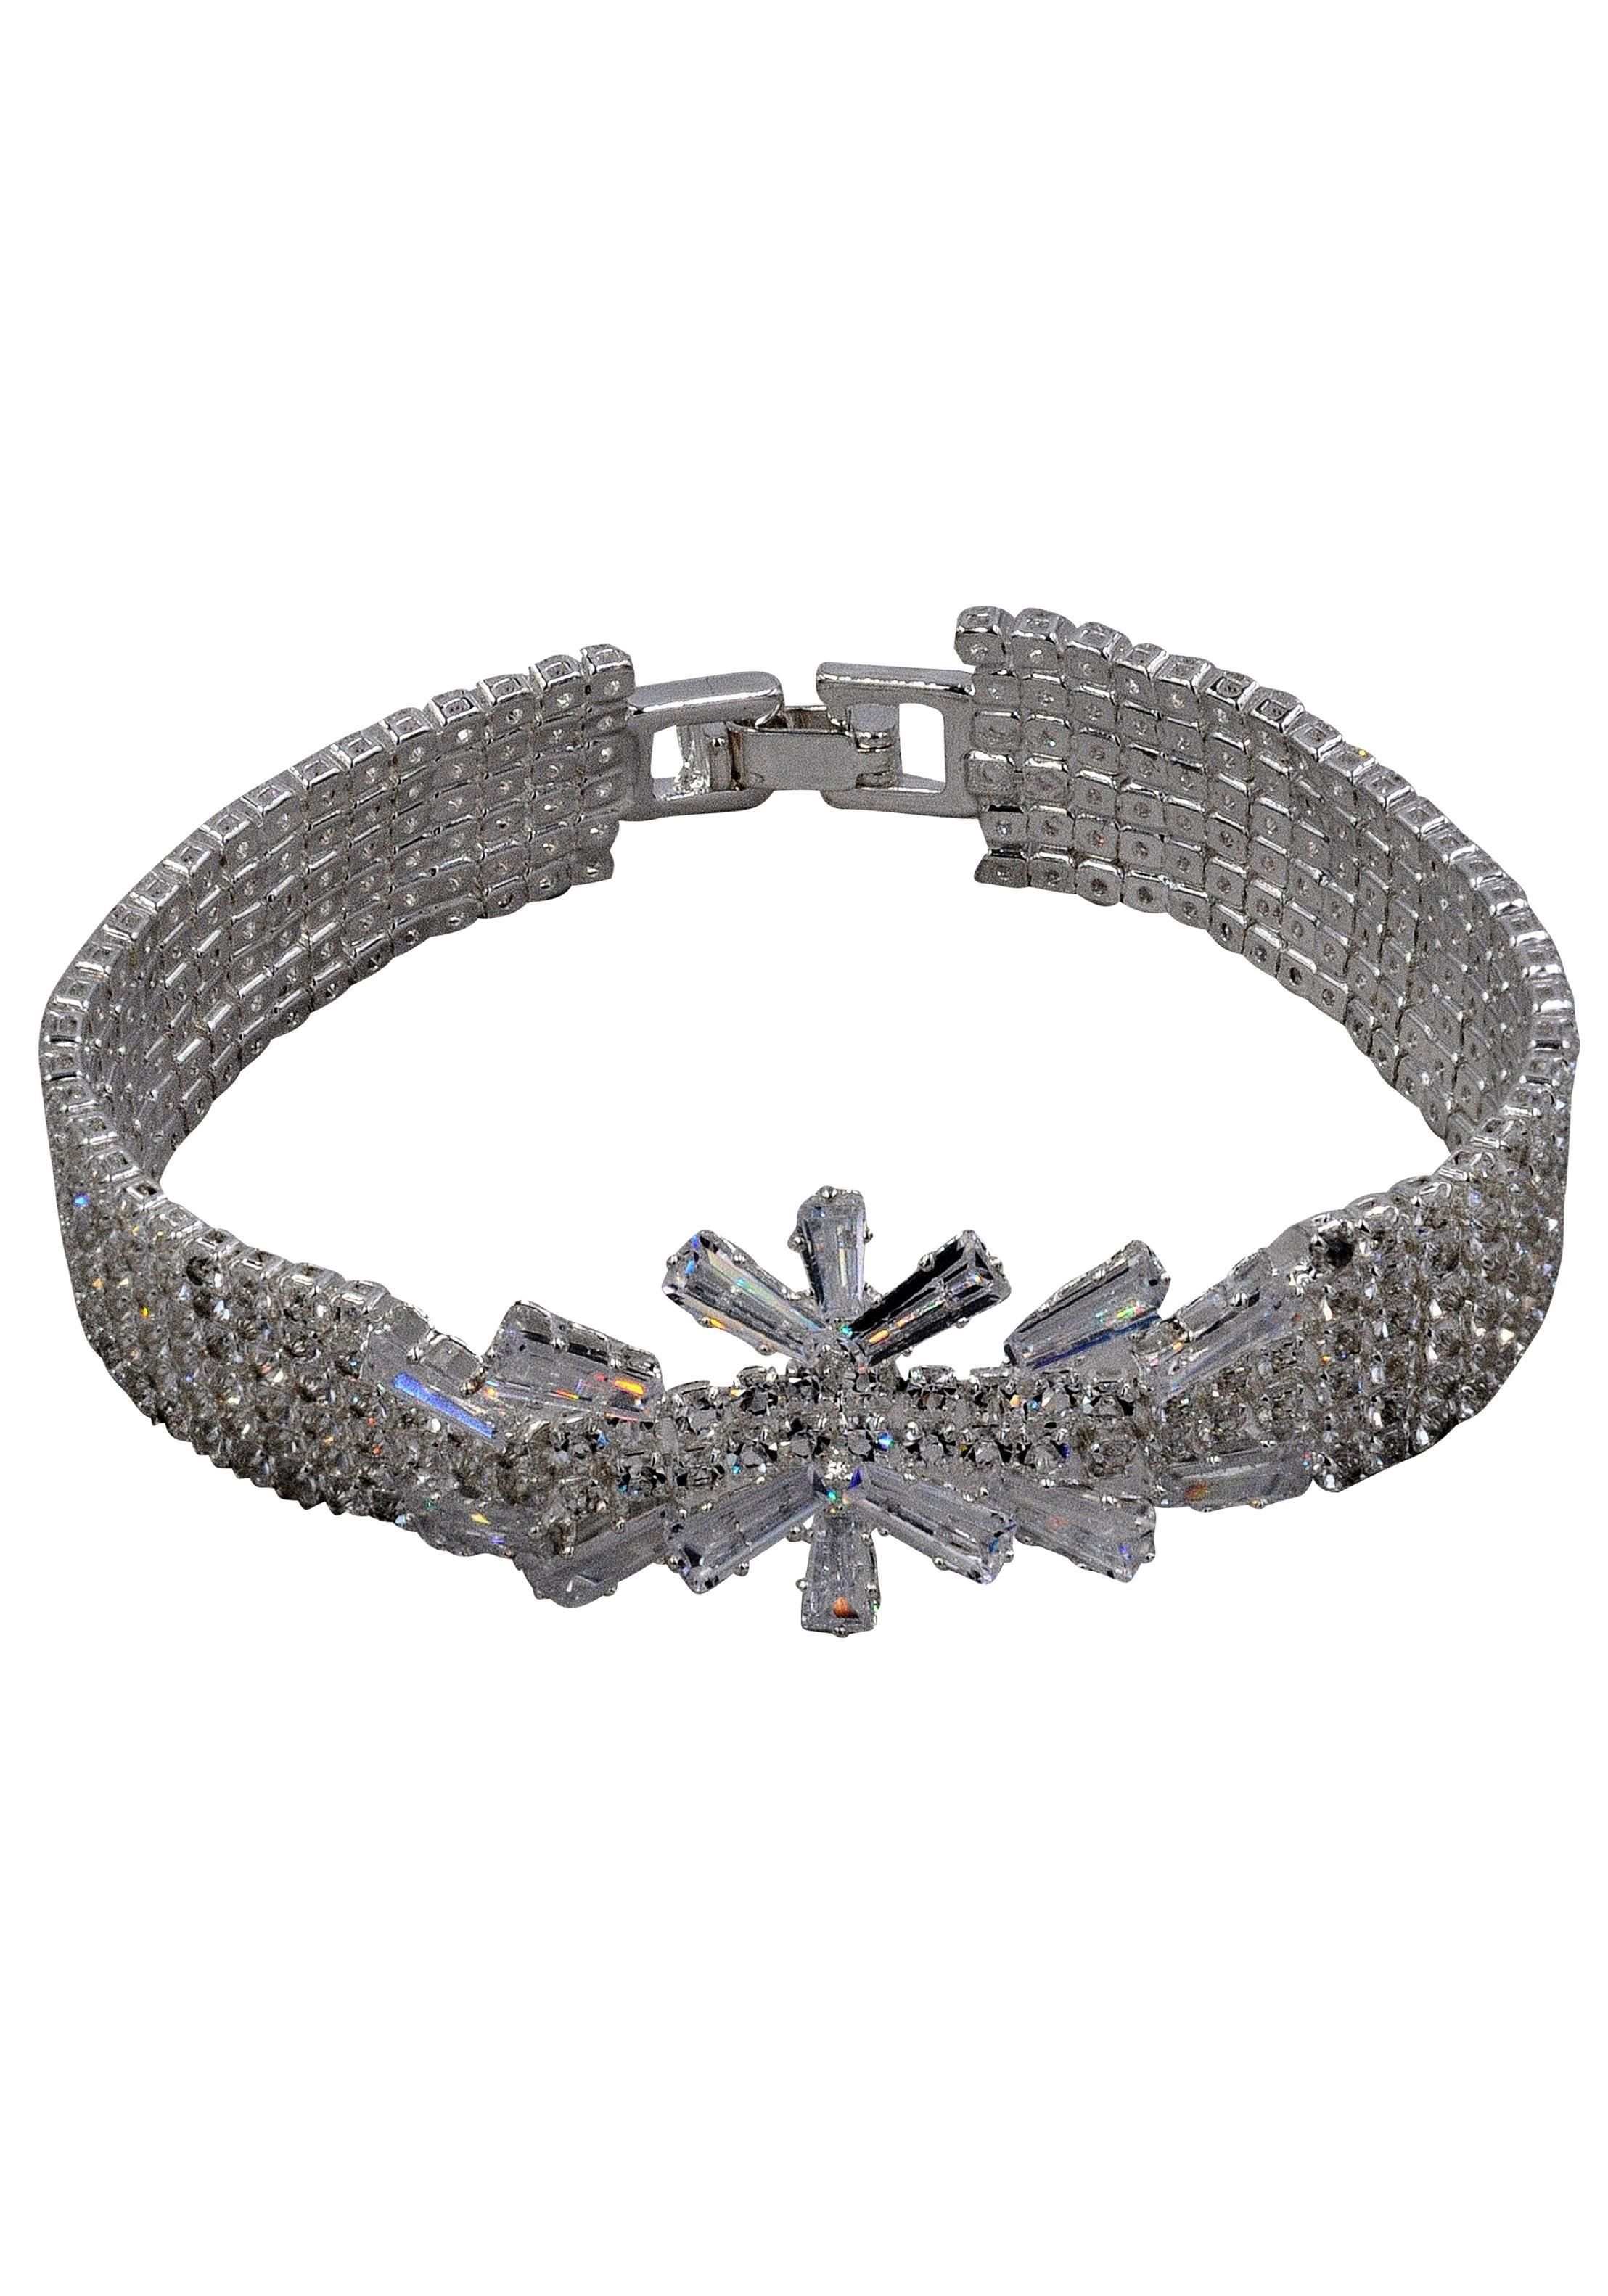 J JAYZ armband »elegant, glamourös« goedkoop op otto.nl kopen